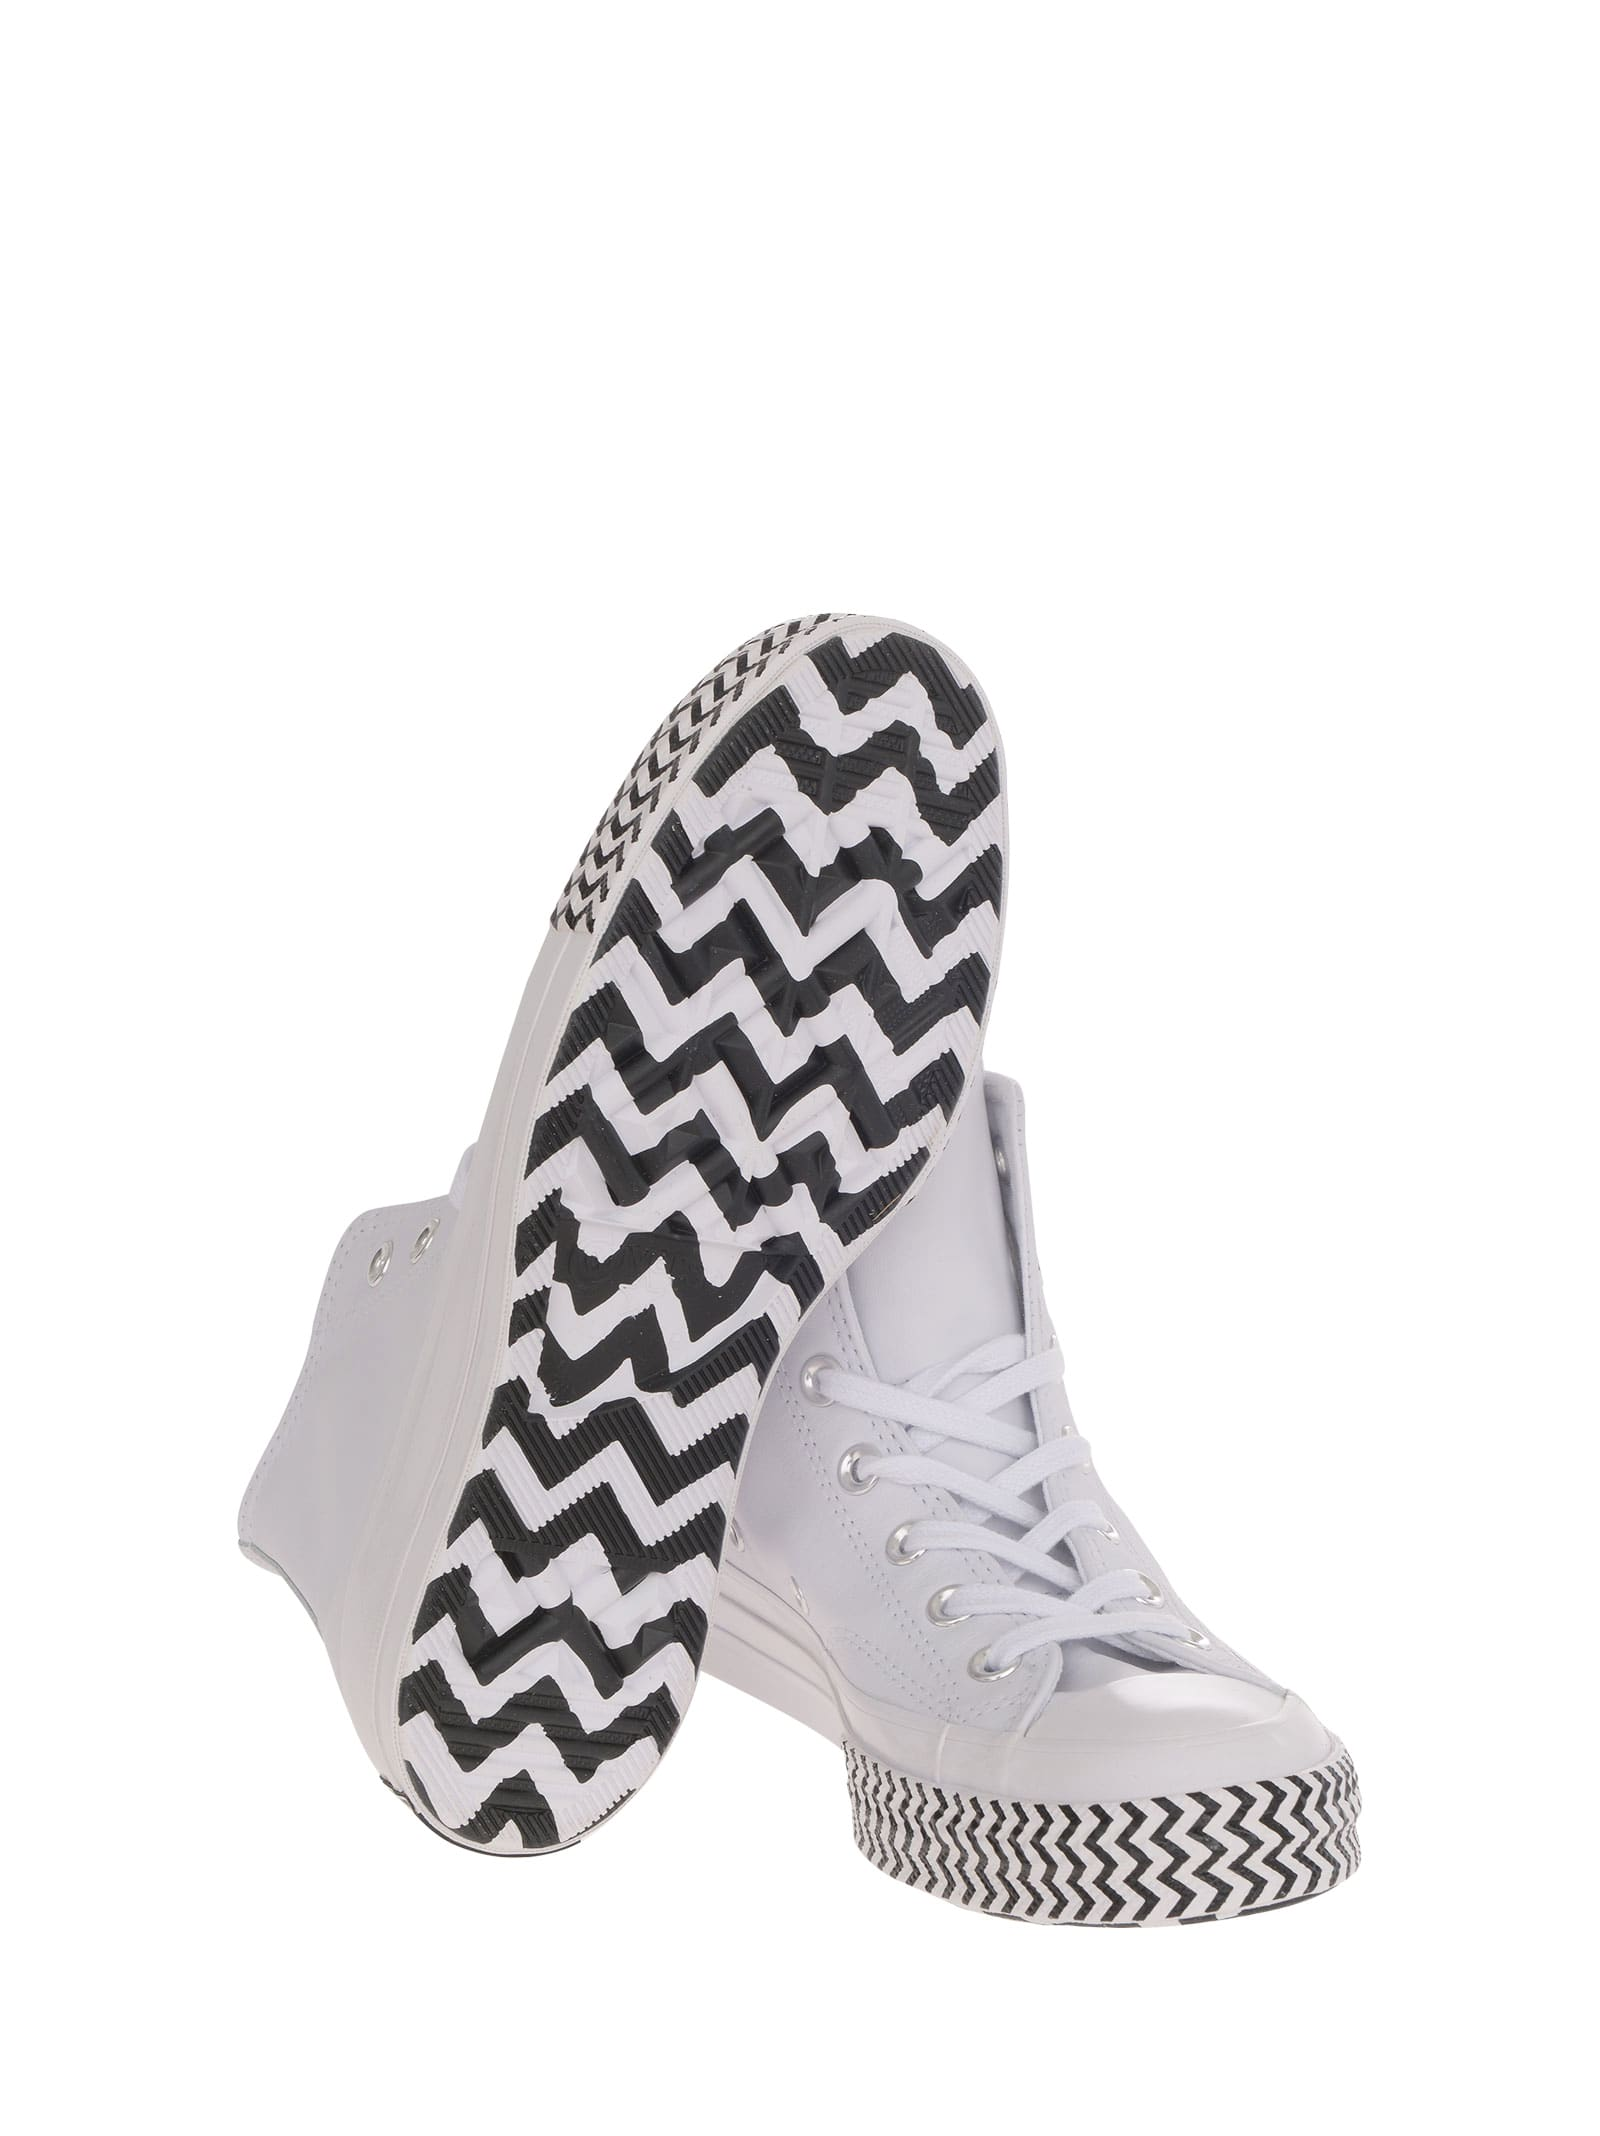 Converse Converse Sneakers White 11097403   italist